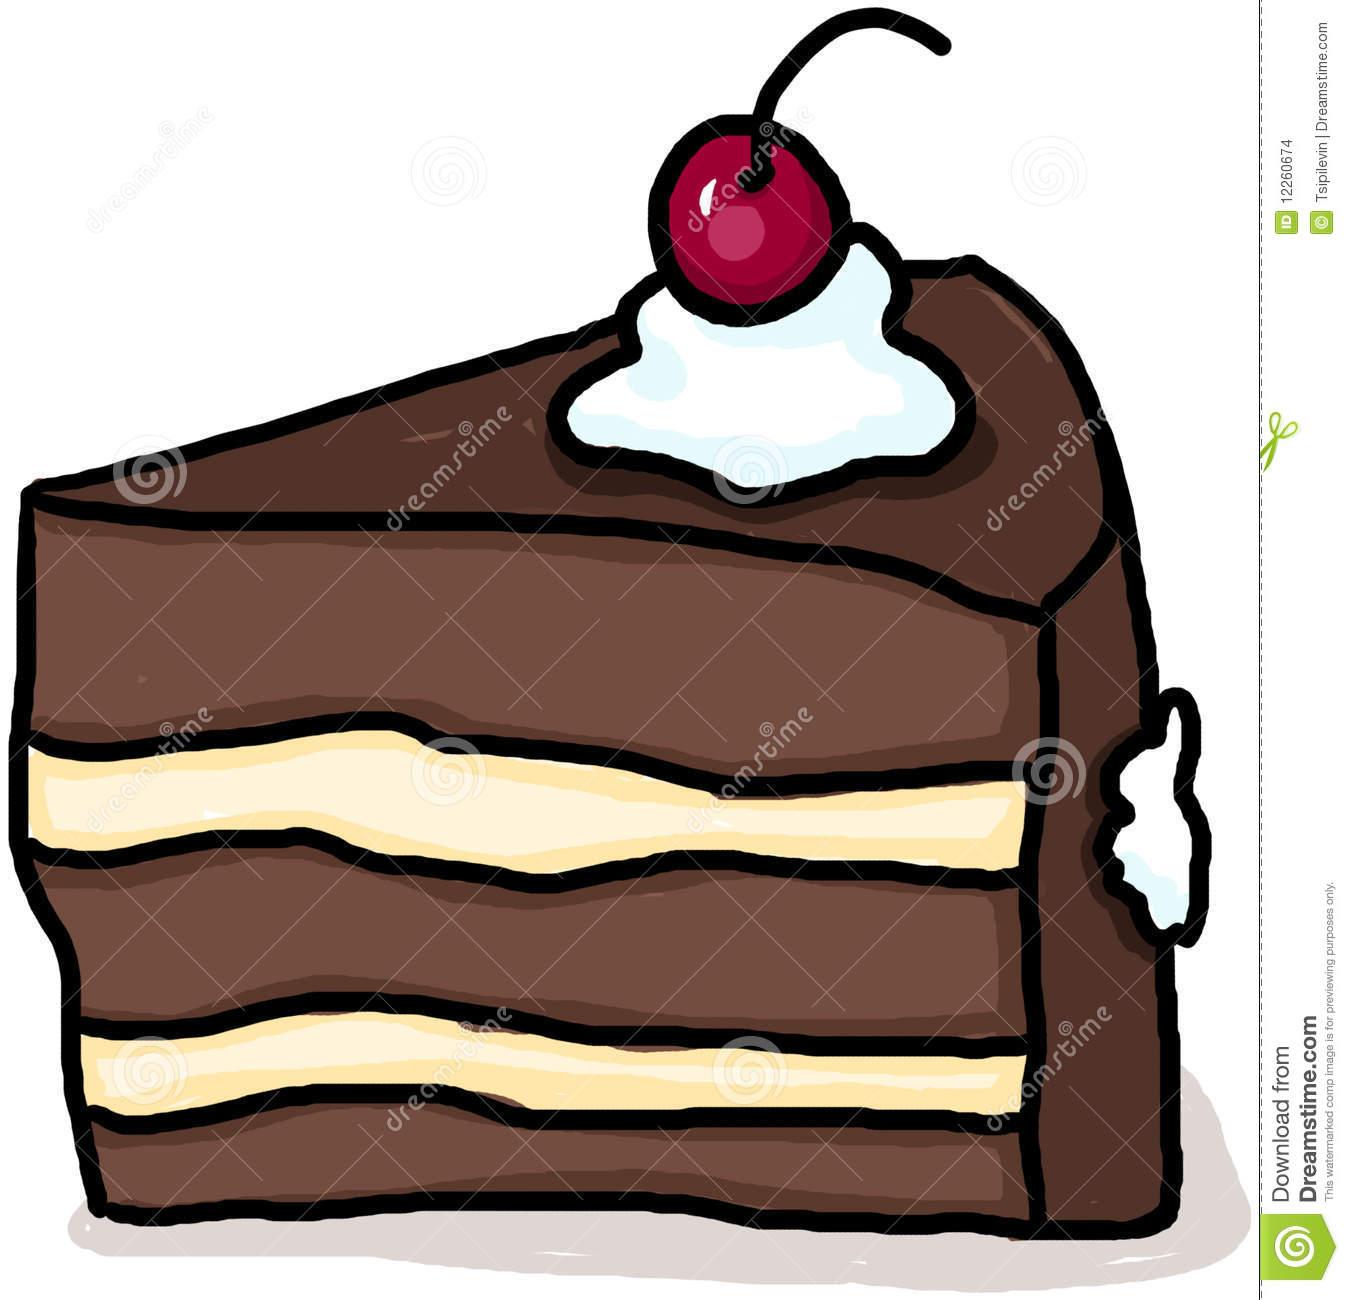 Cake clipart cake slice, Picture #145990 cake clipart cake slice.